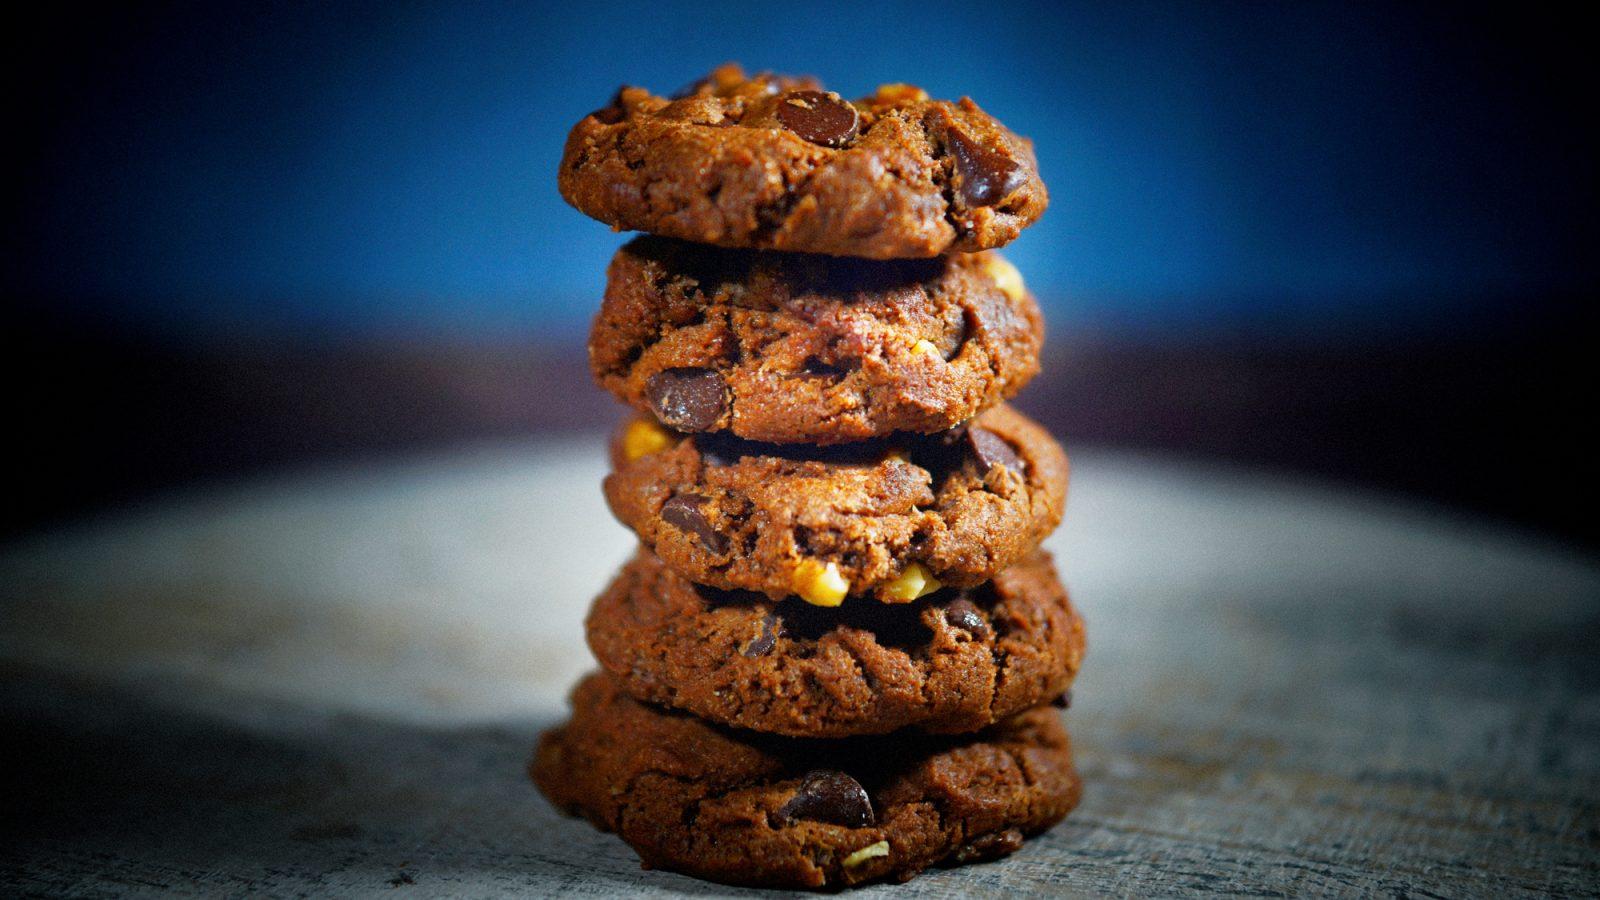 vegan chocolate cookies on a plate